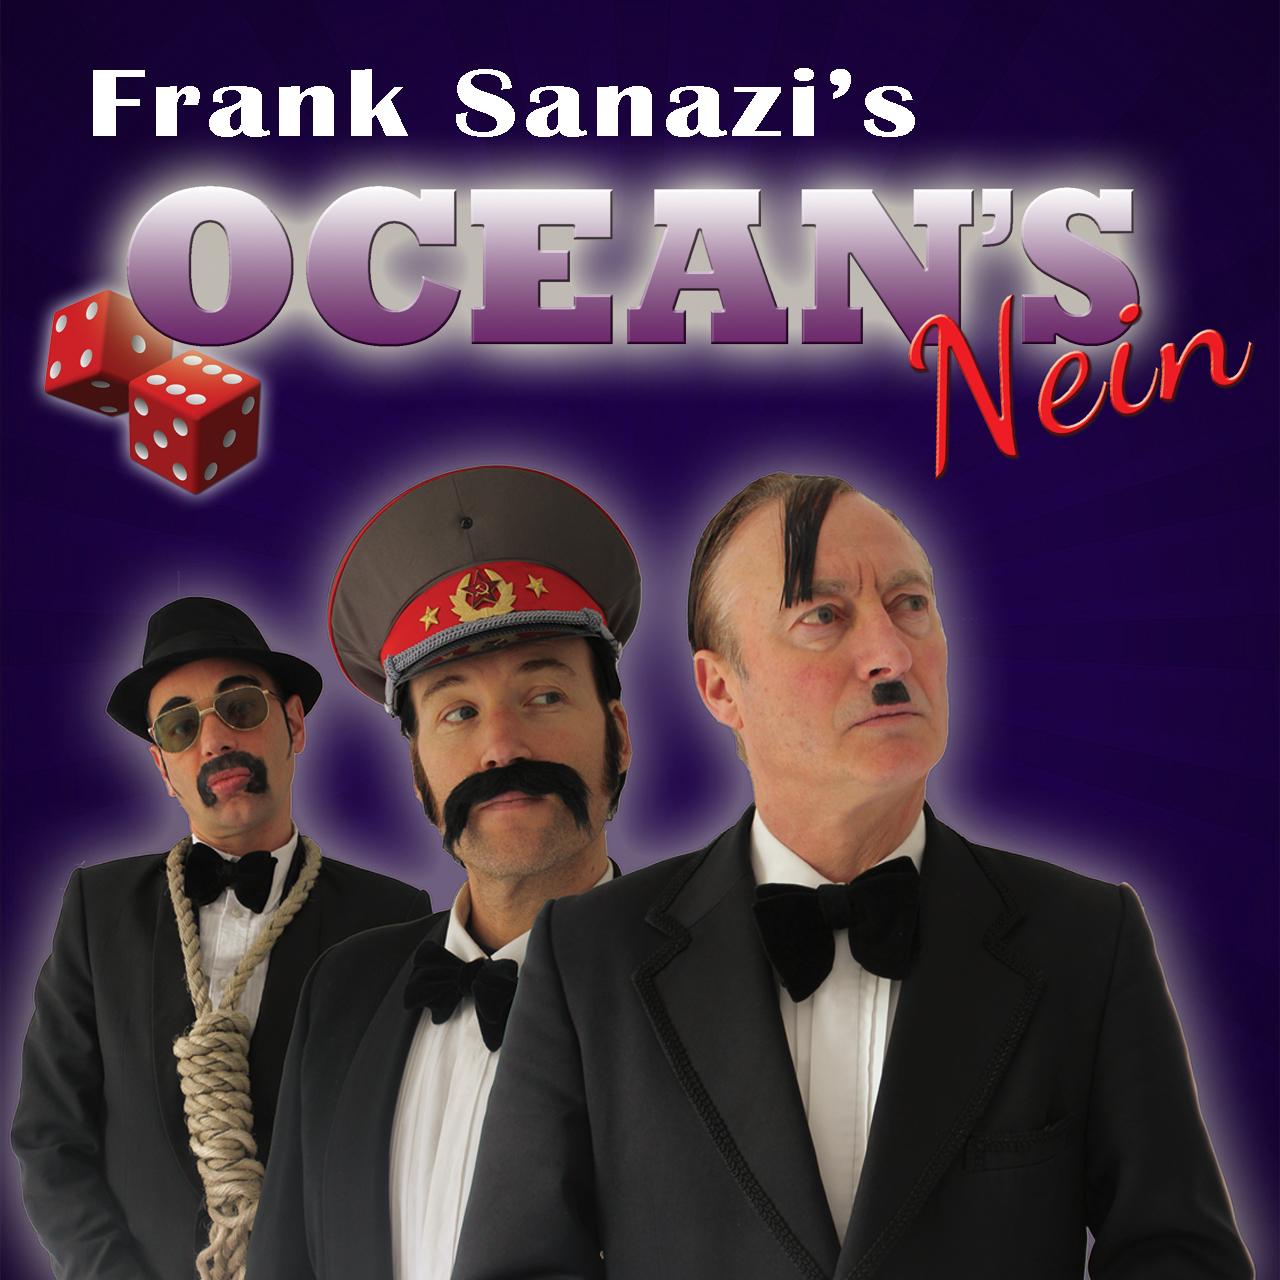 Frank Sanazi's Oceans Nein